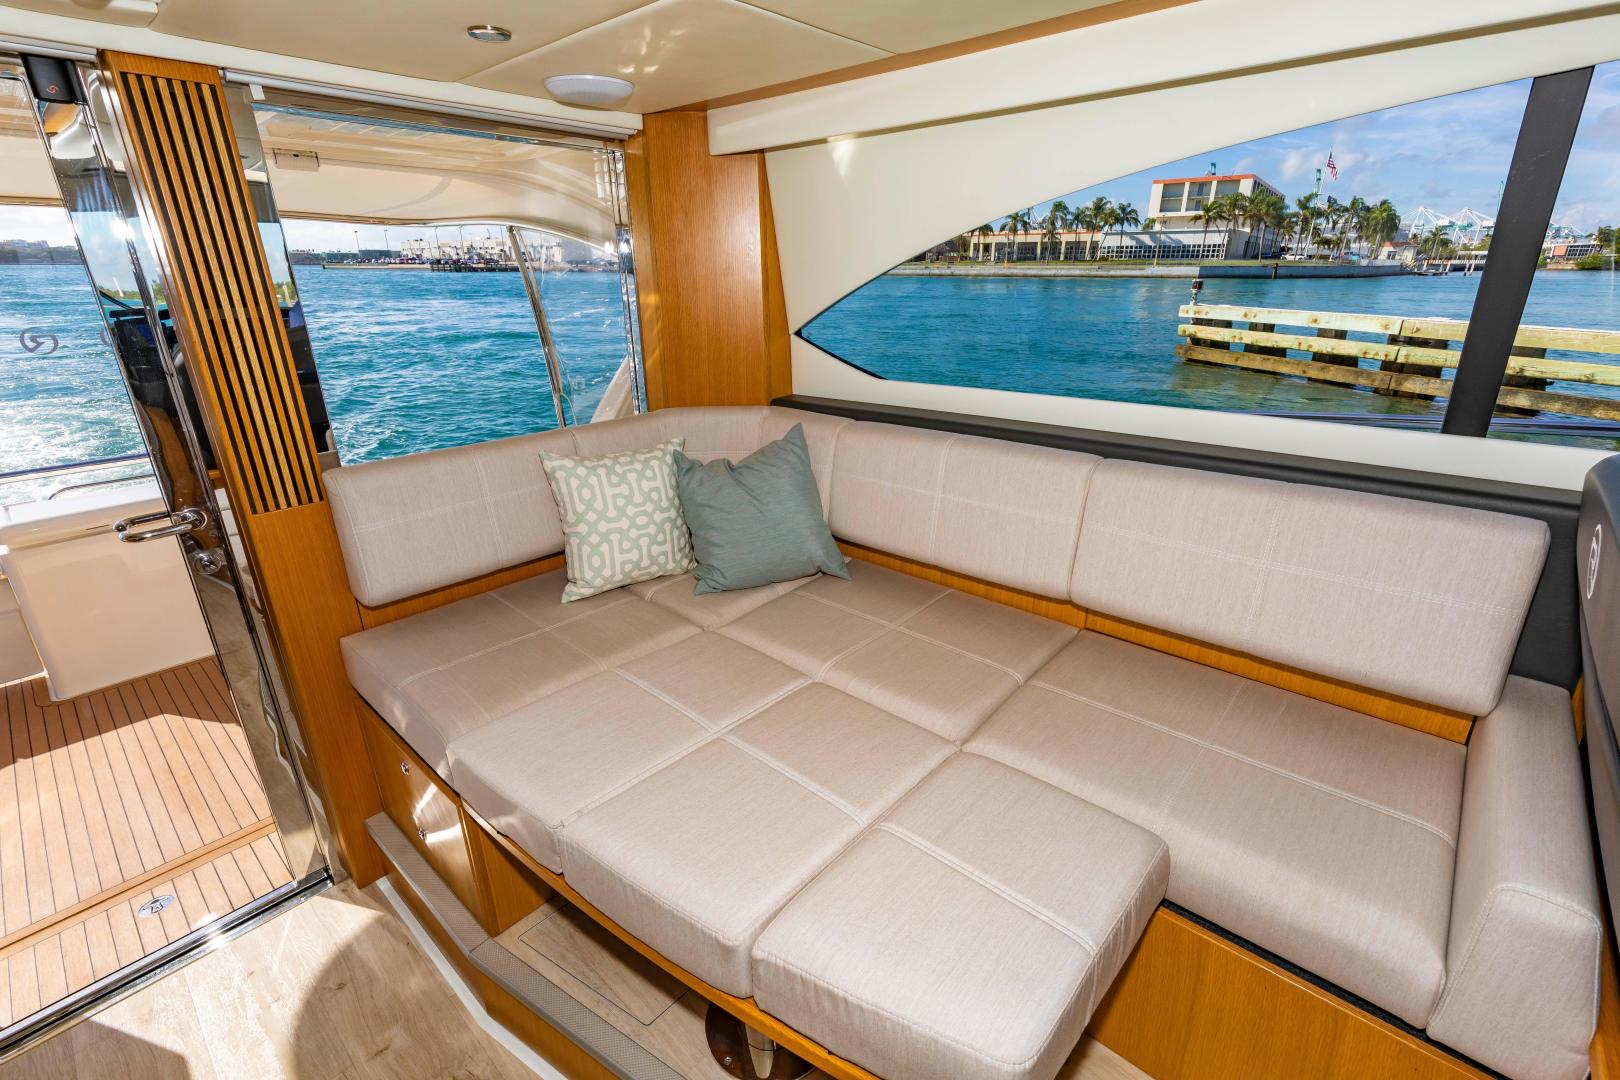 Riviera-395 SUV 2019-Ipanema Miami Beach-Florida-United States-1614903   Thumbnail